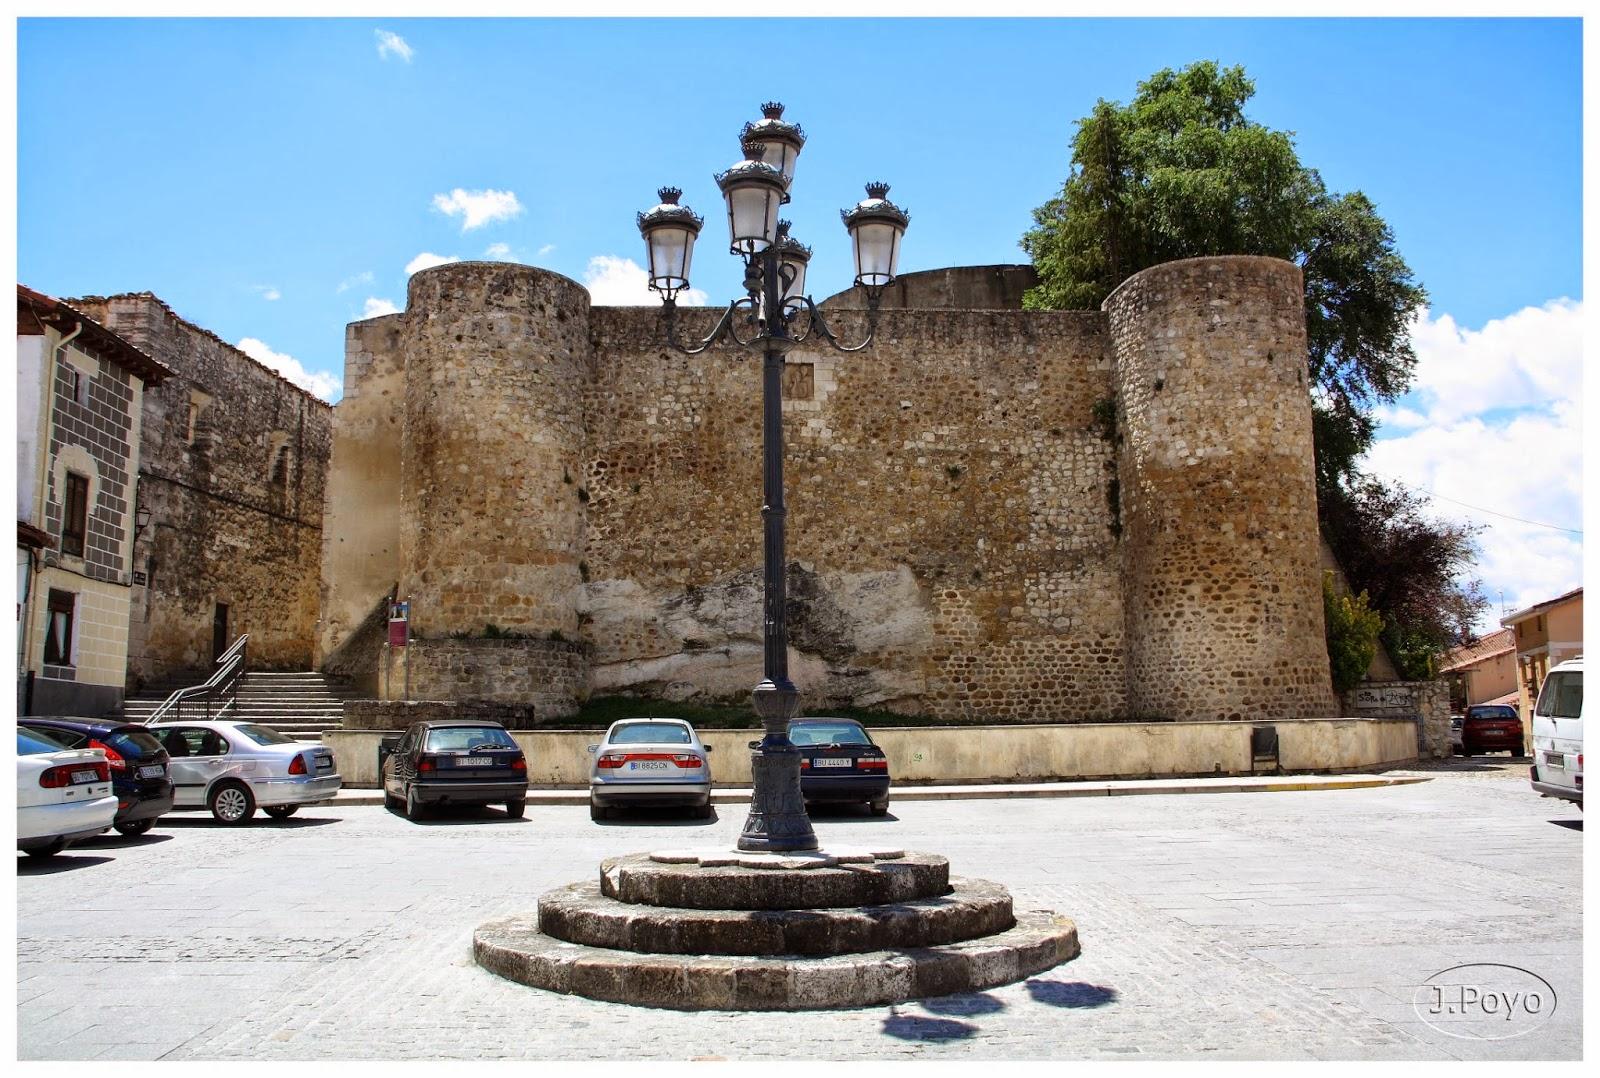 Plazuela del Corral, Medina de Pomar